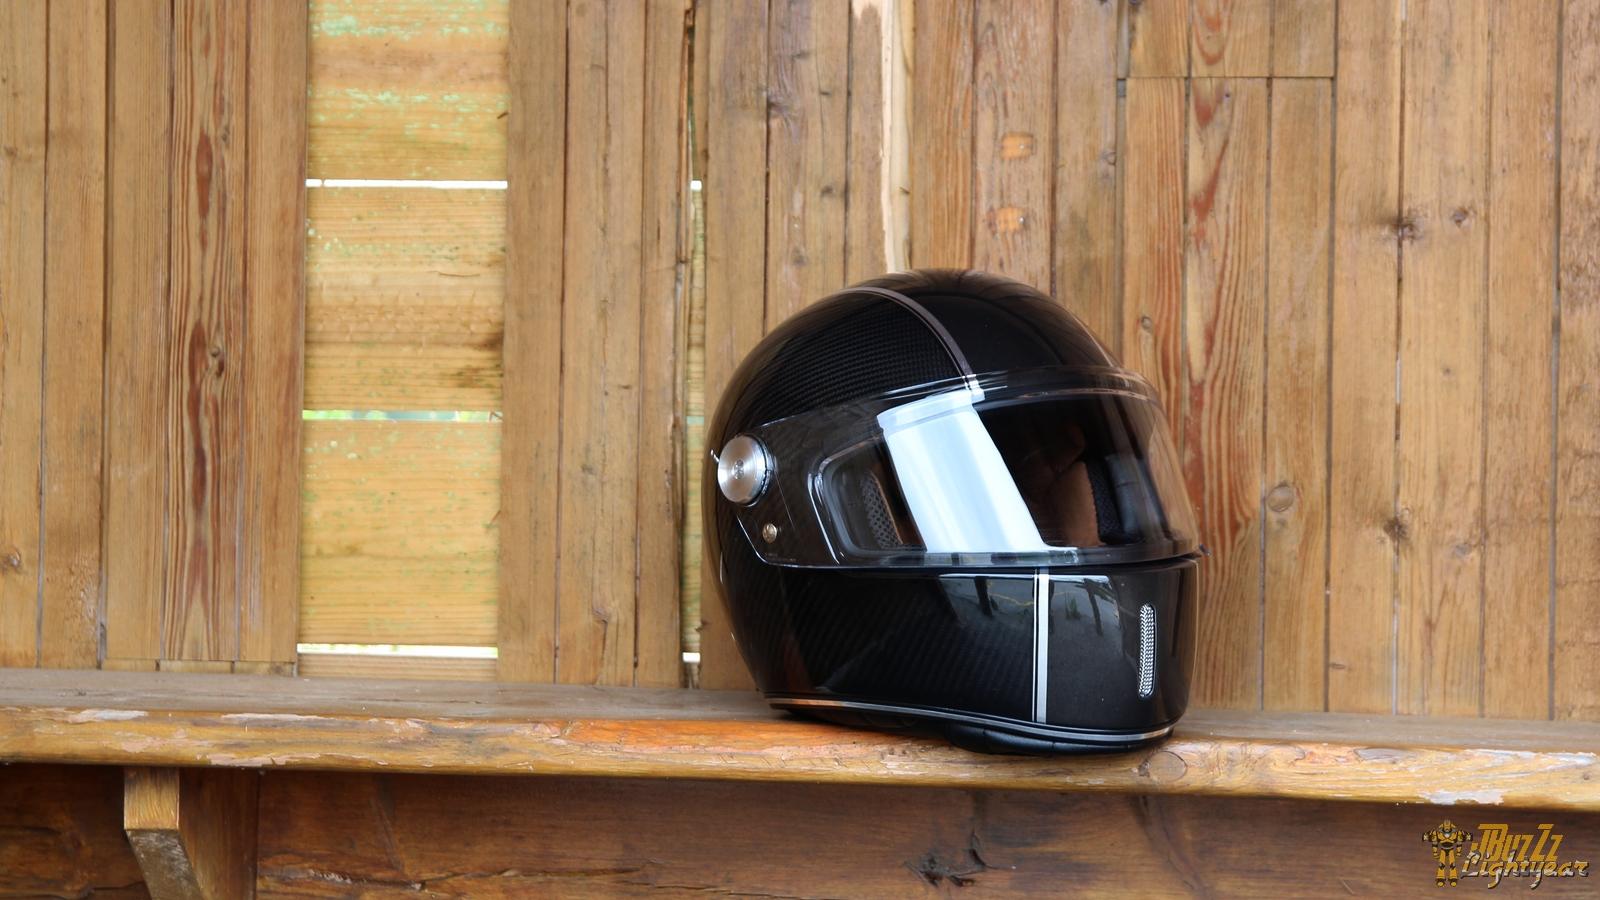 Design soigné pour le casque NEXX X.G100 Racer